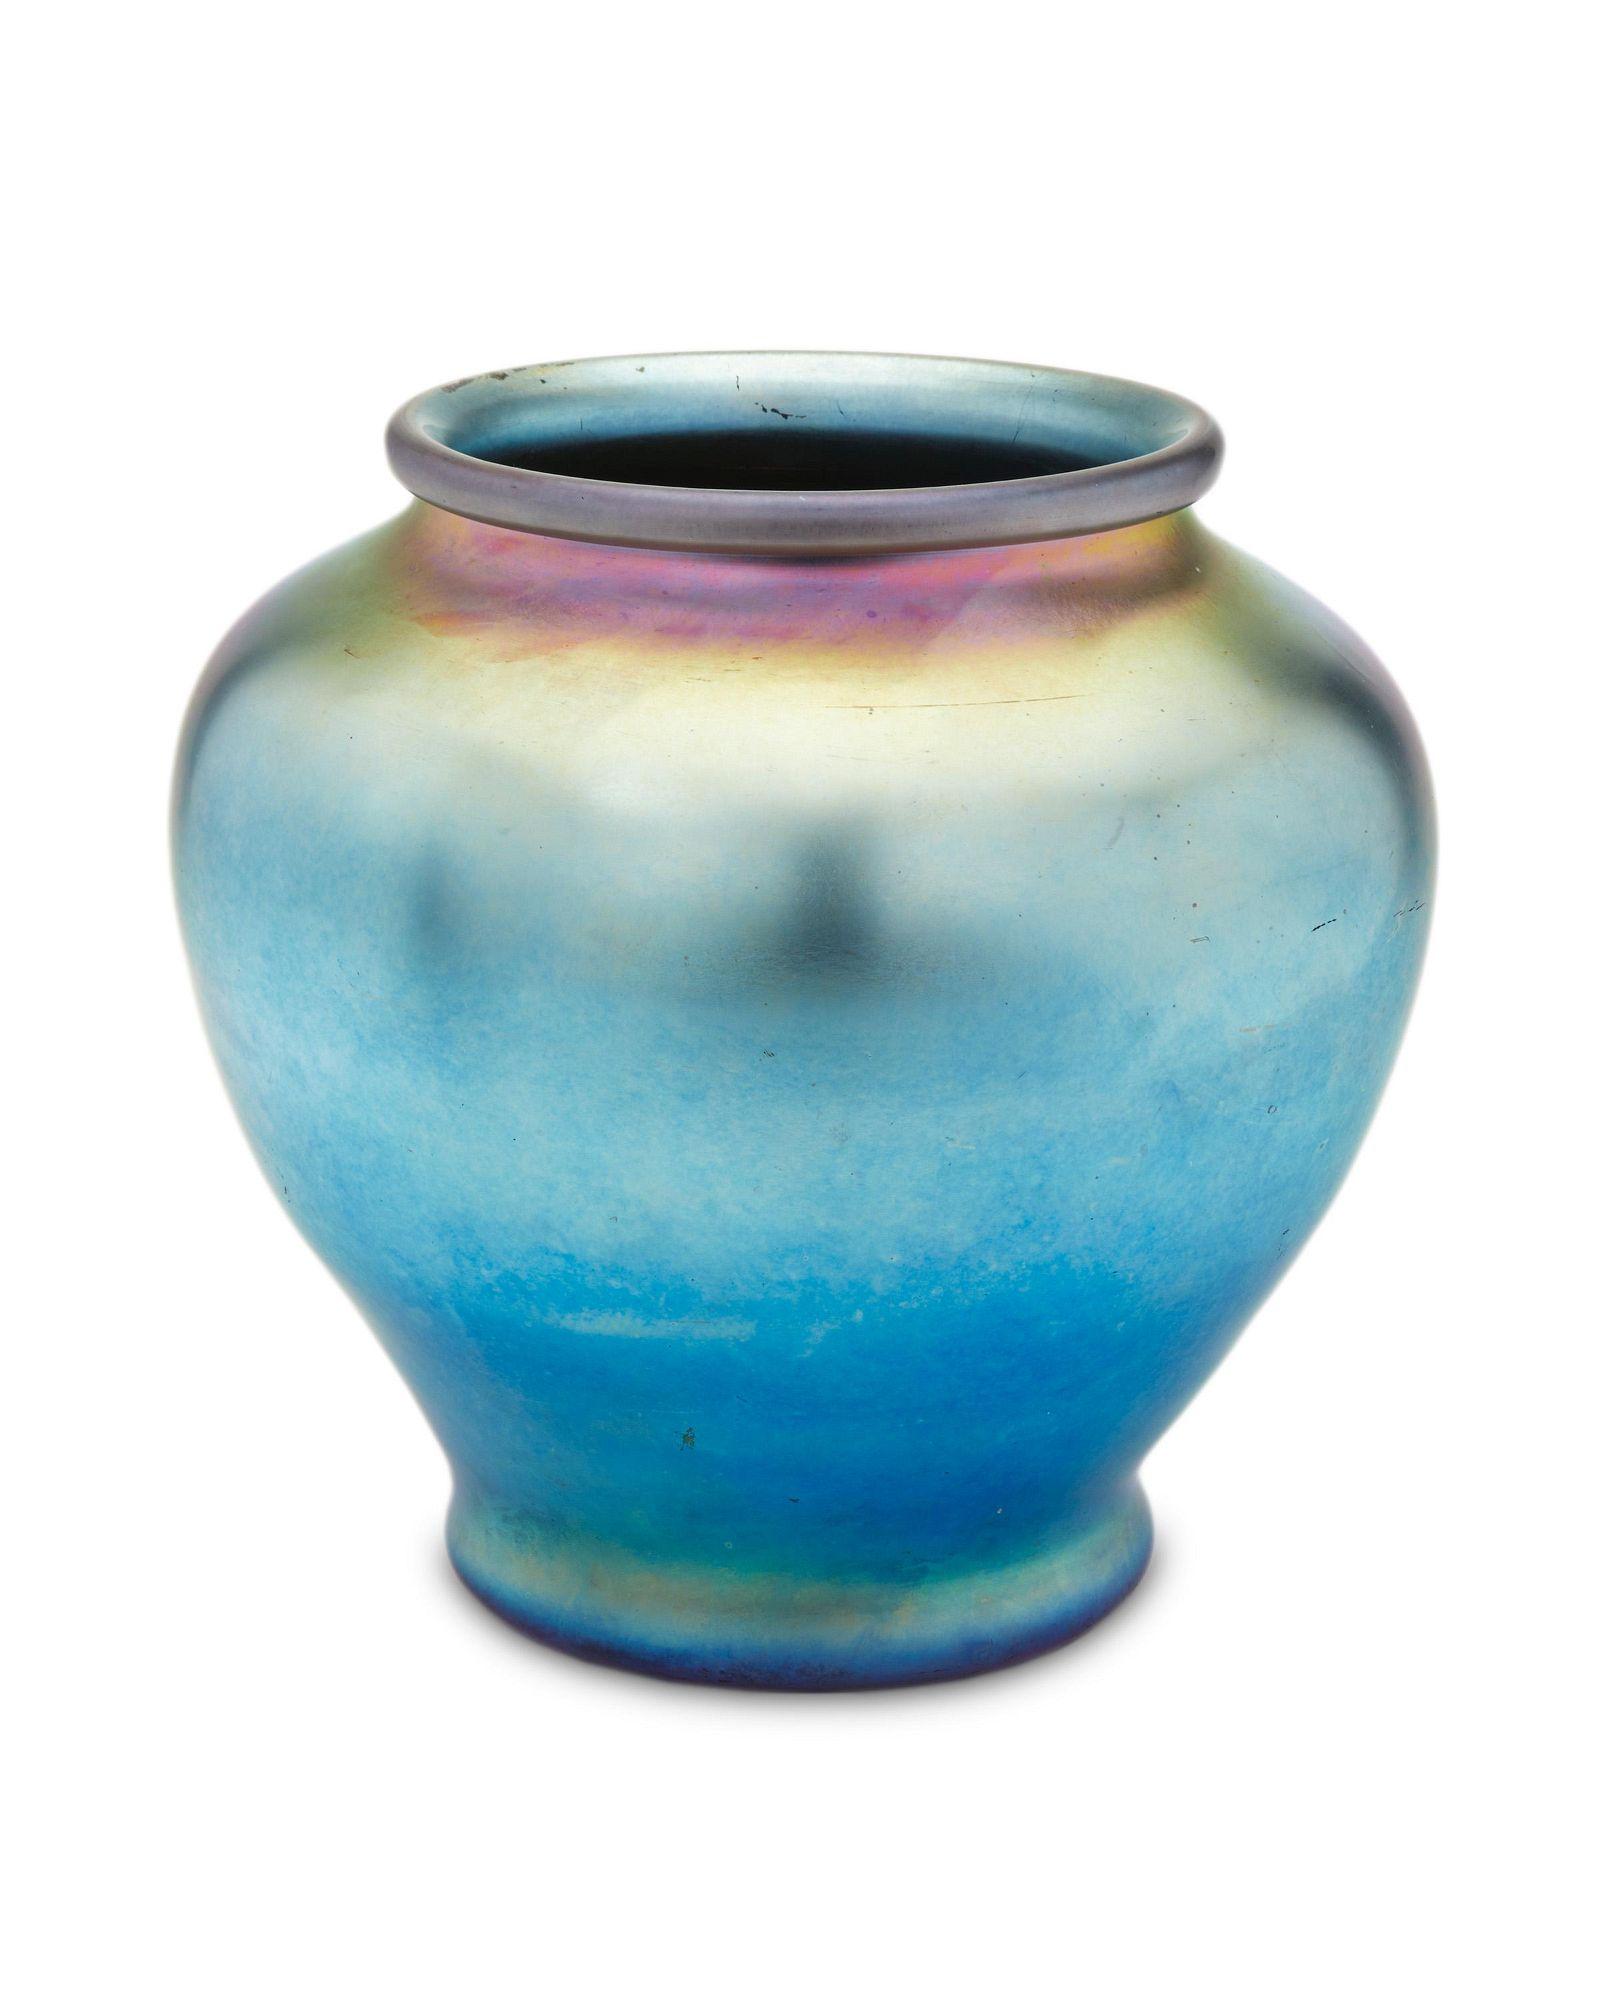 A blue Steuben Aurene glass vase